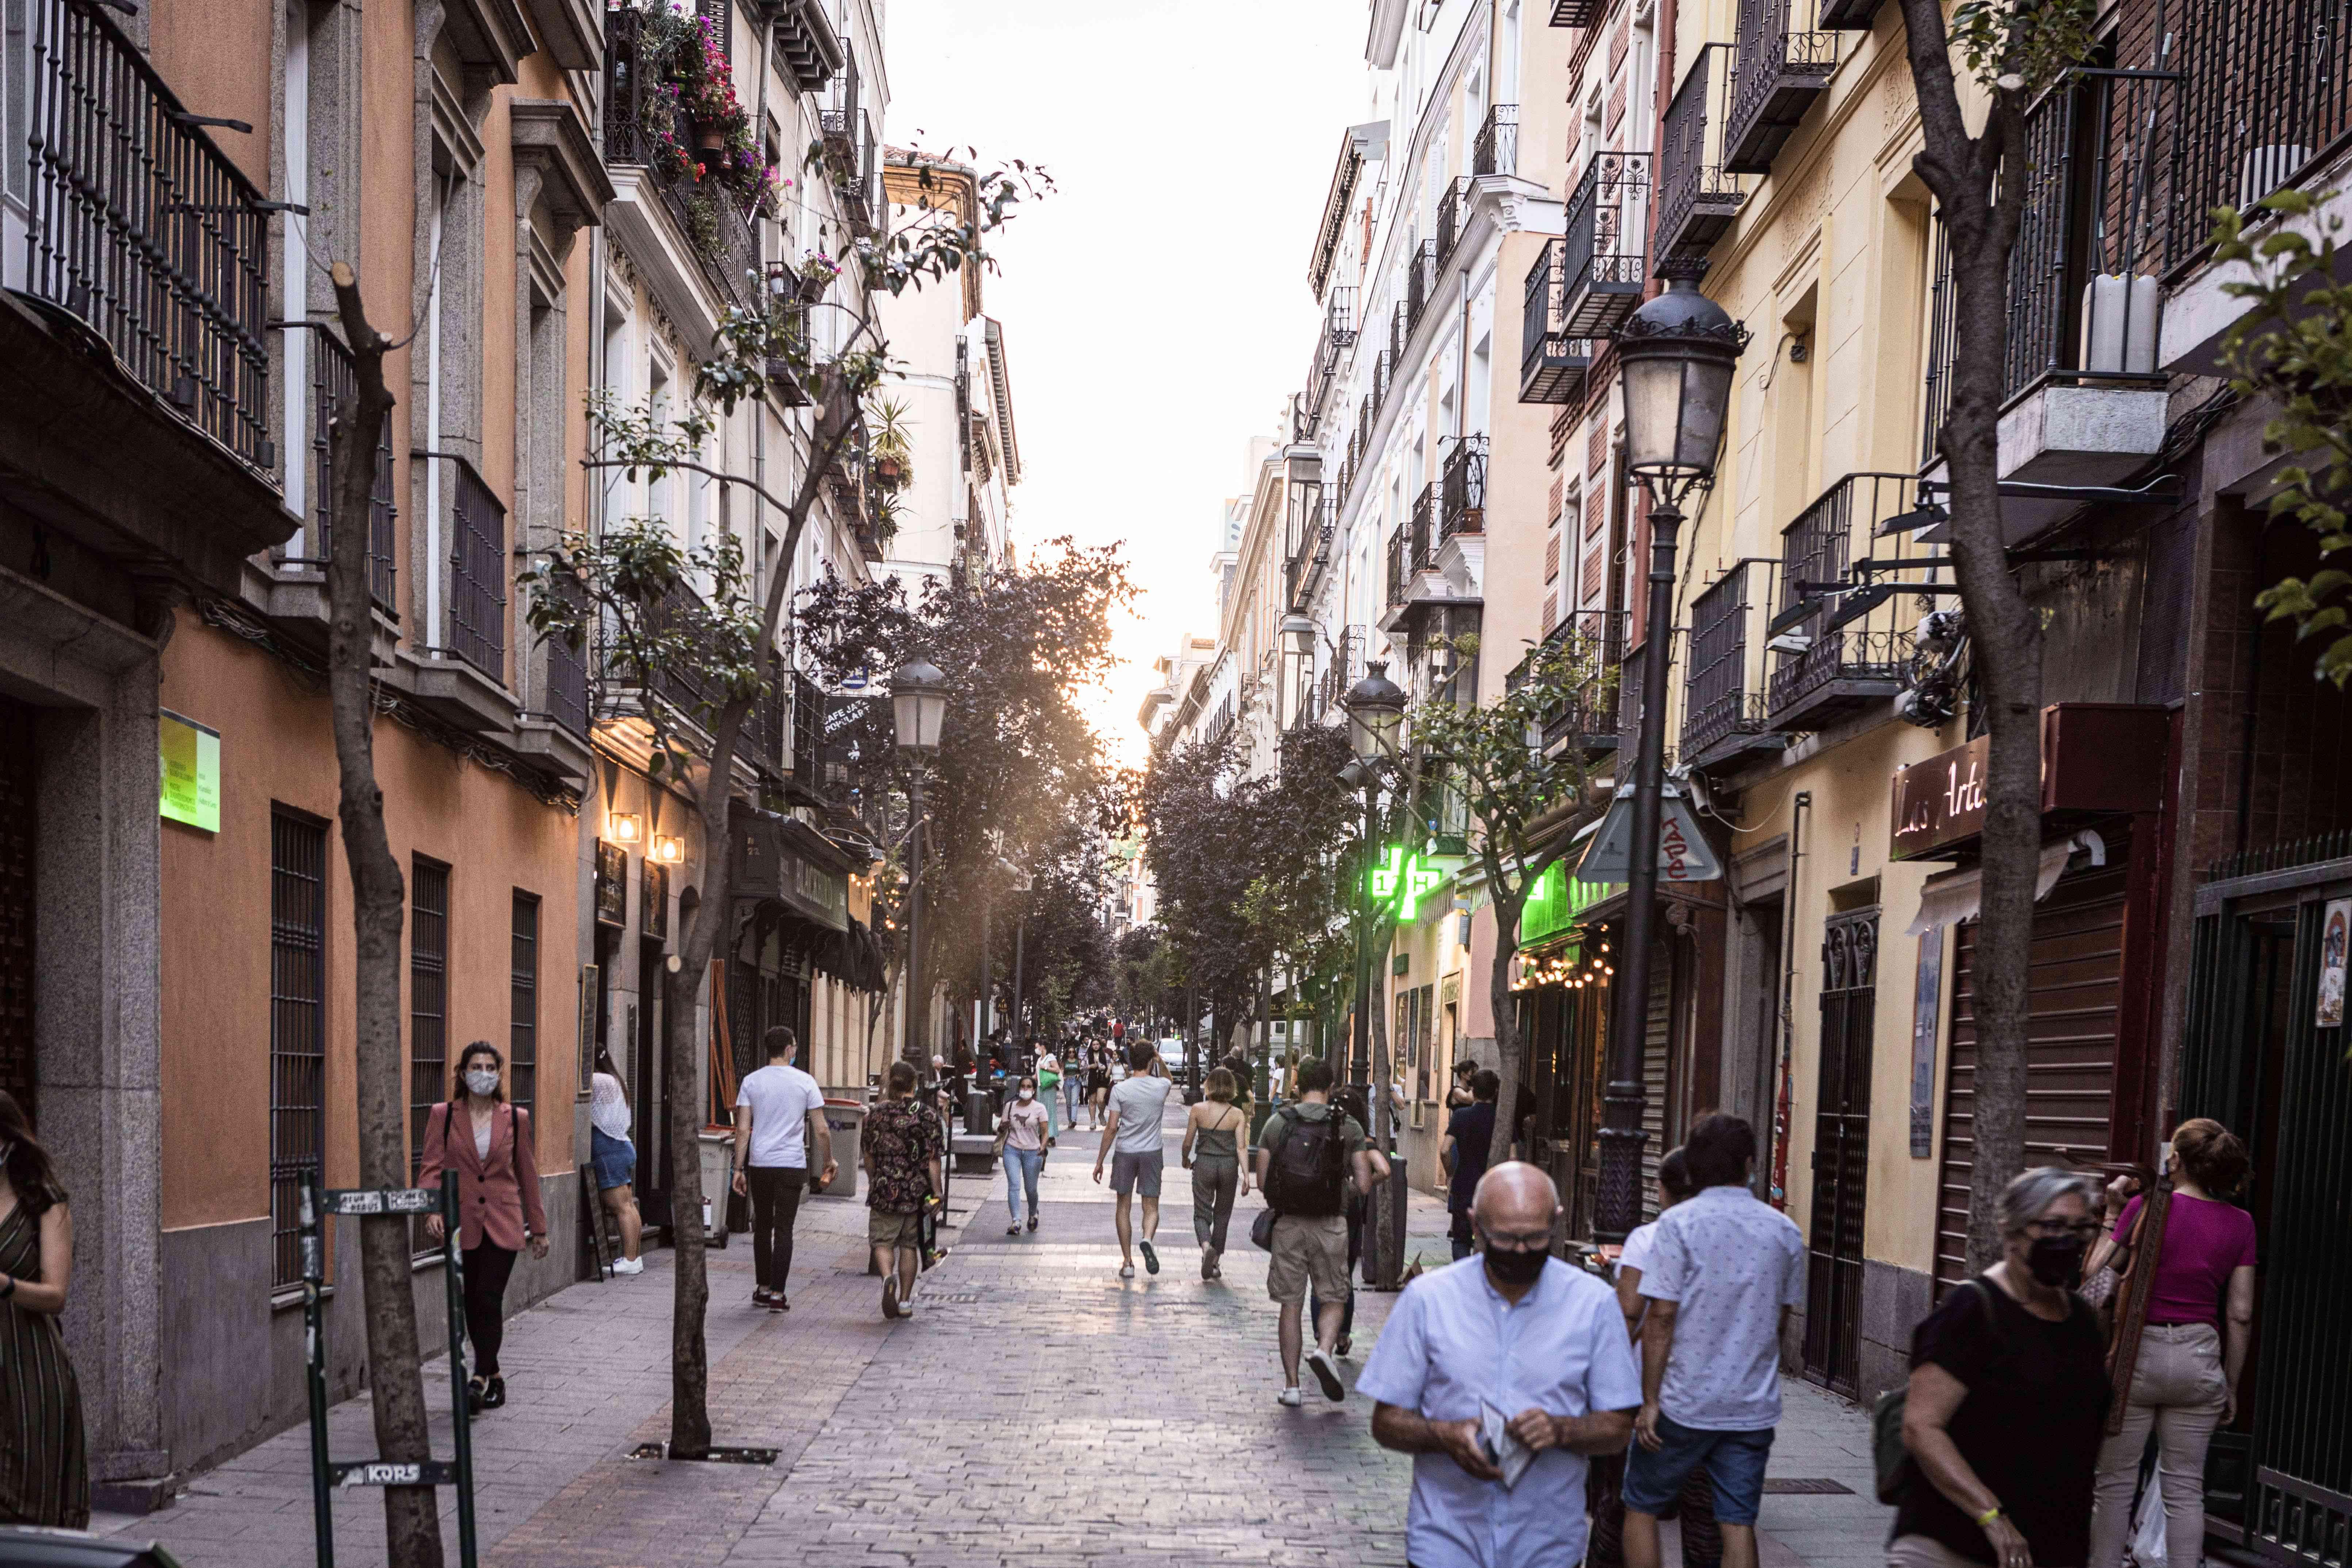 Calle Huertas, Madrid, Spain